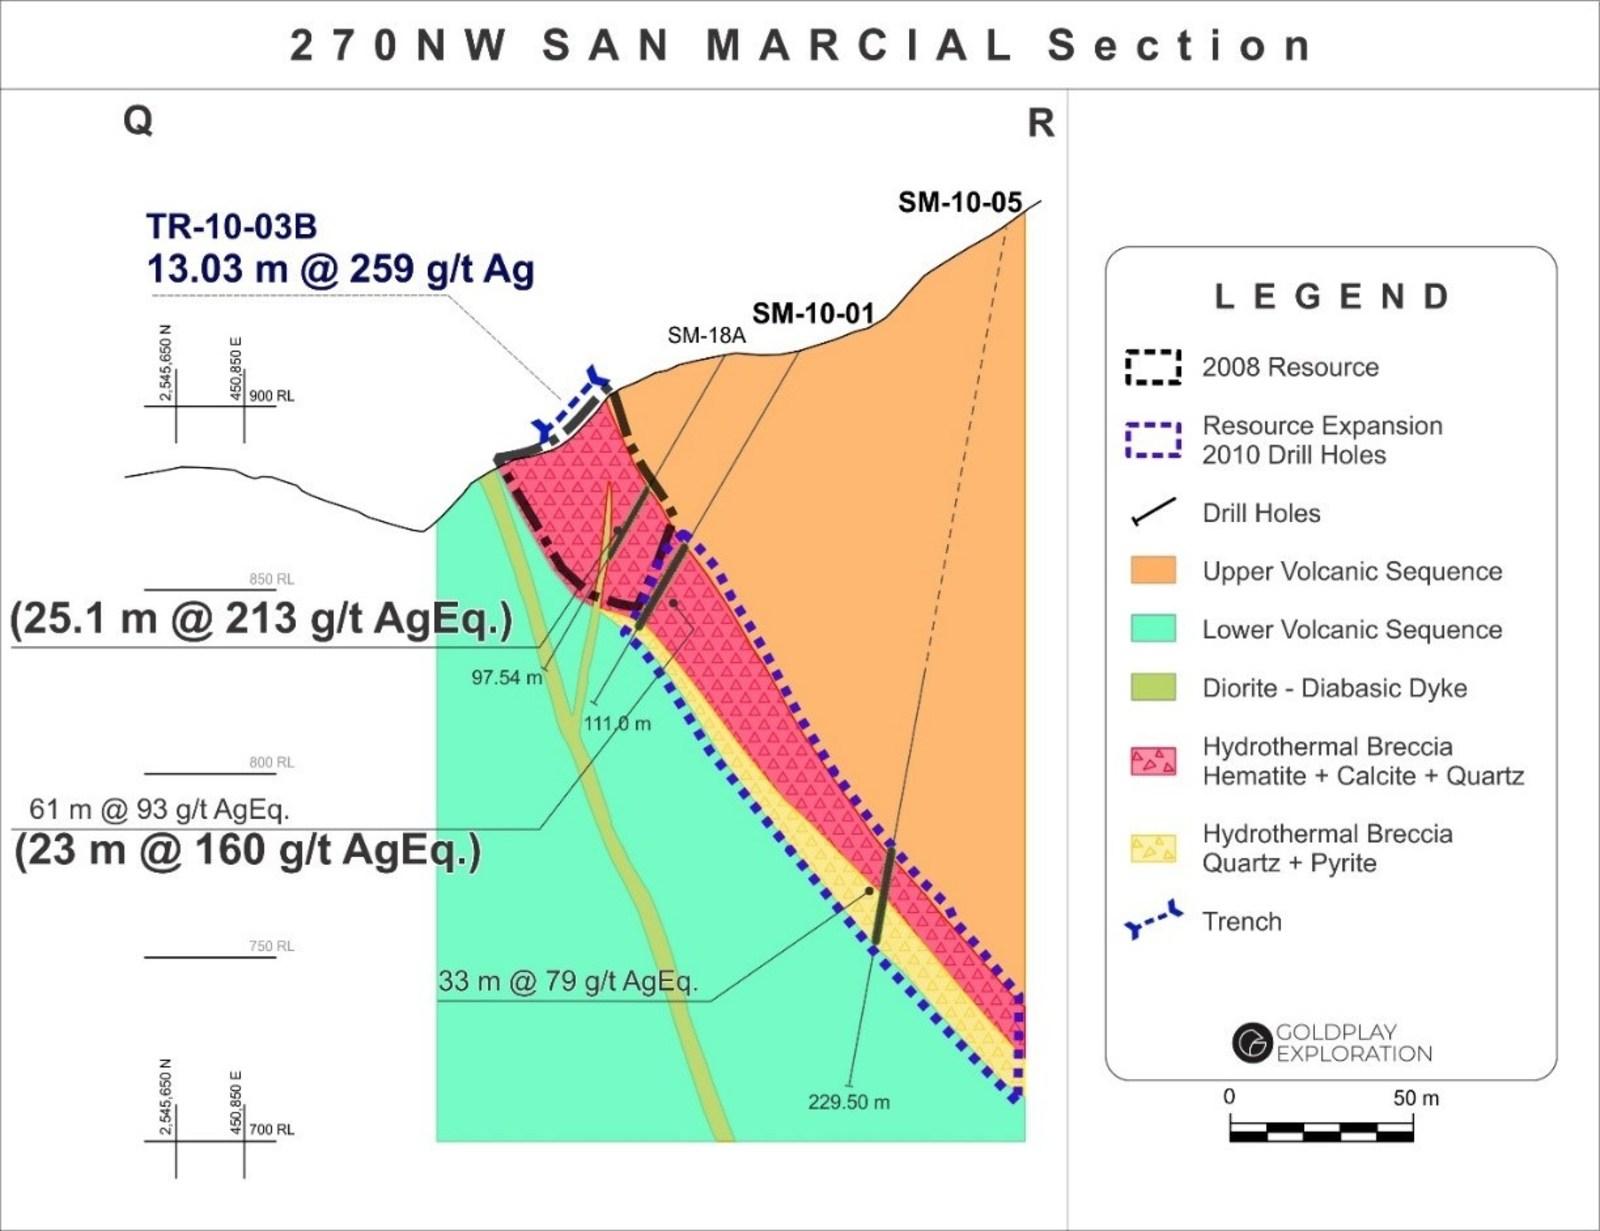 Figure 2: San Marcial Cross Section Q-R